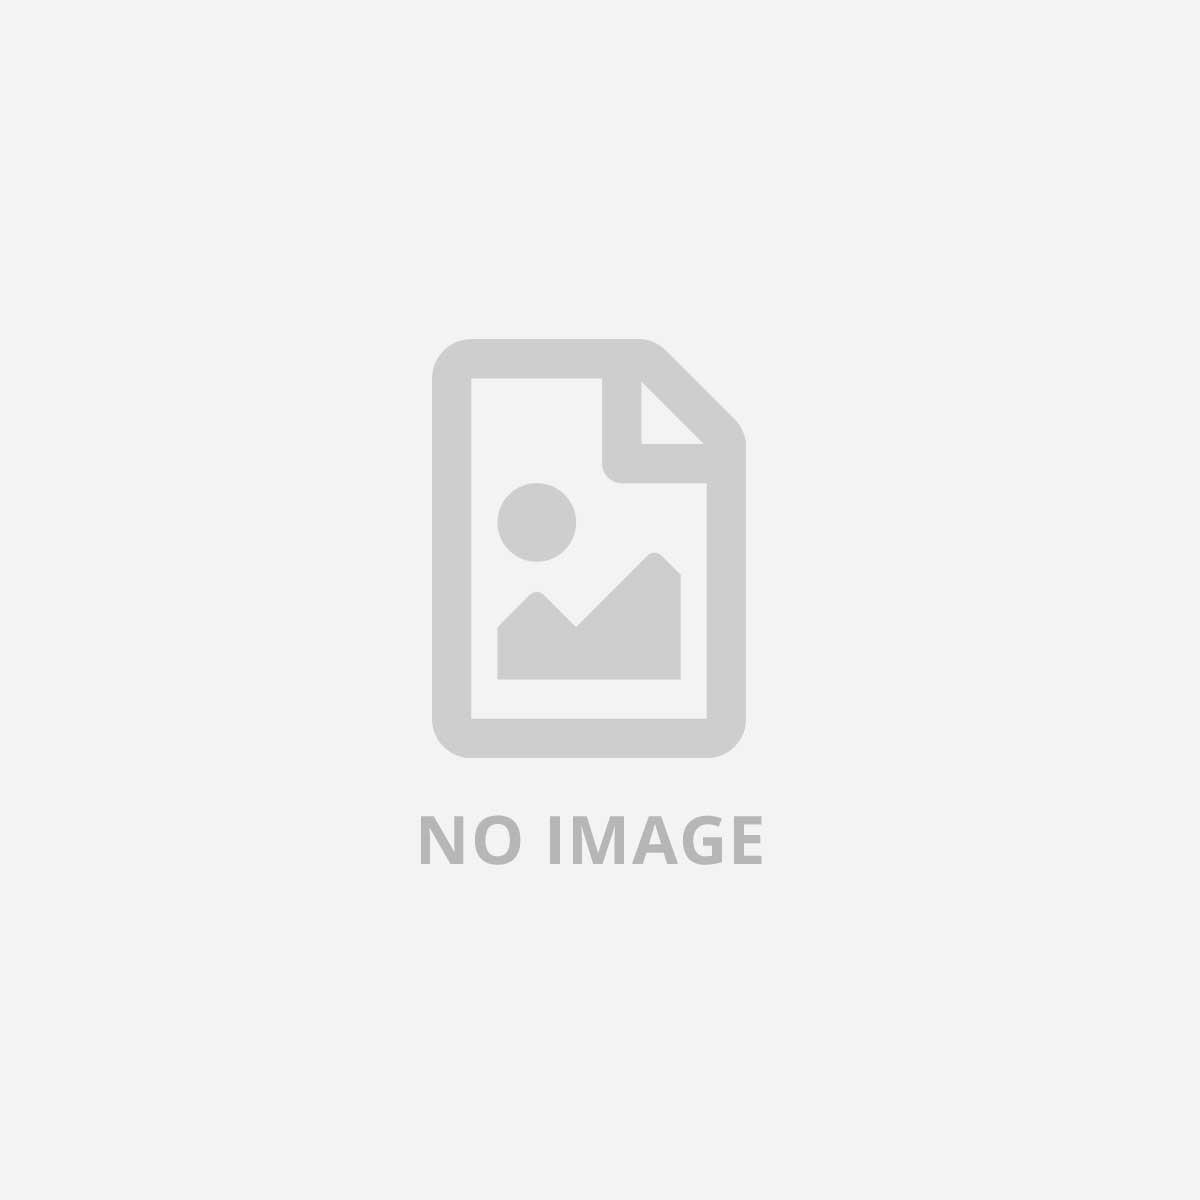 YEALINK ULTRA-ELEGANT IP PHONE T40P ALIMEN